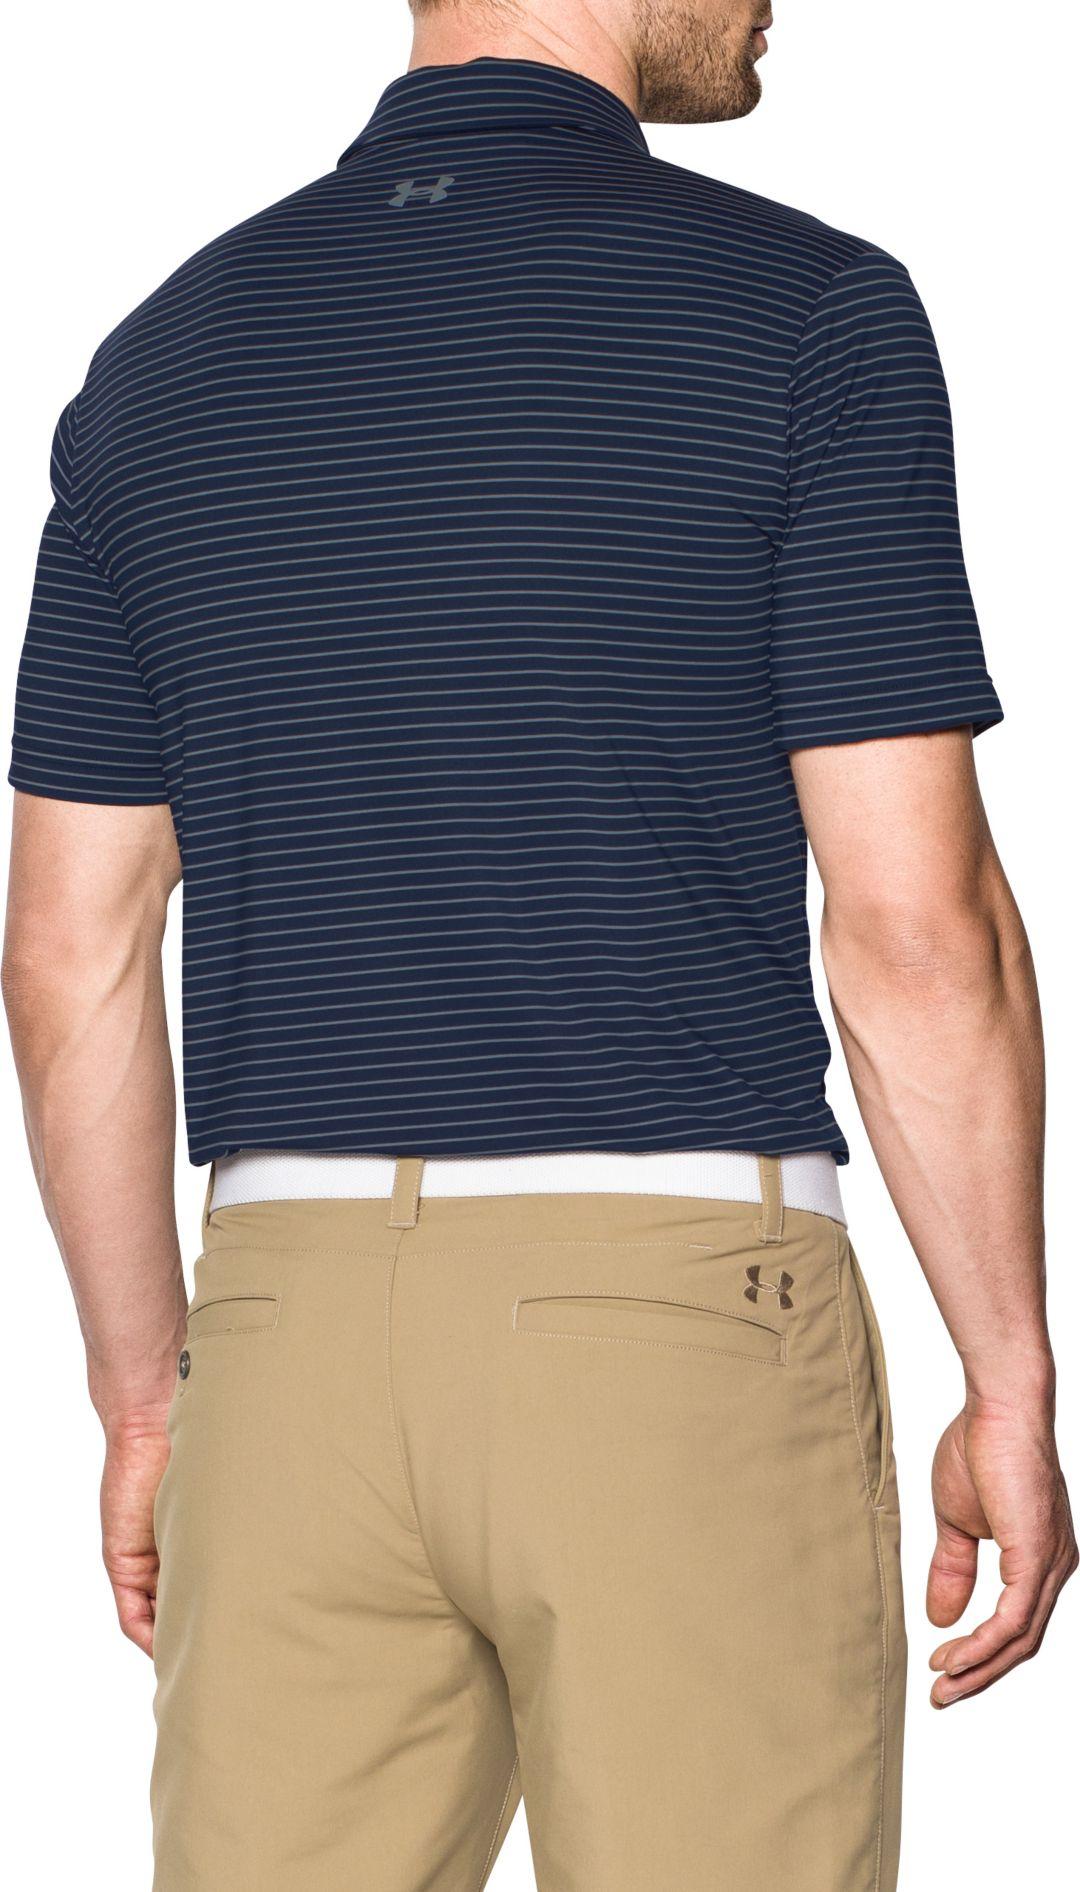 07425b595b Under Armour Men's Playoff Heather Stripe Golf Polo | DICK'S ...